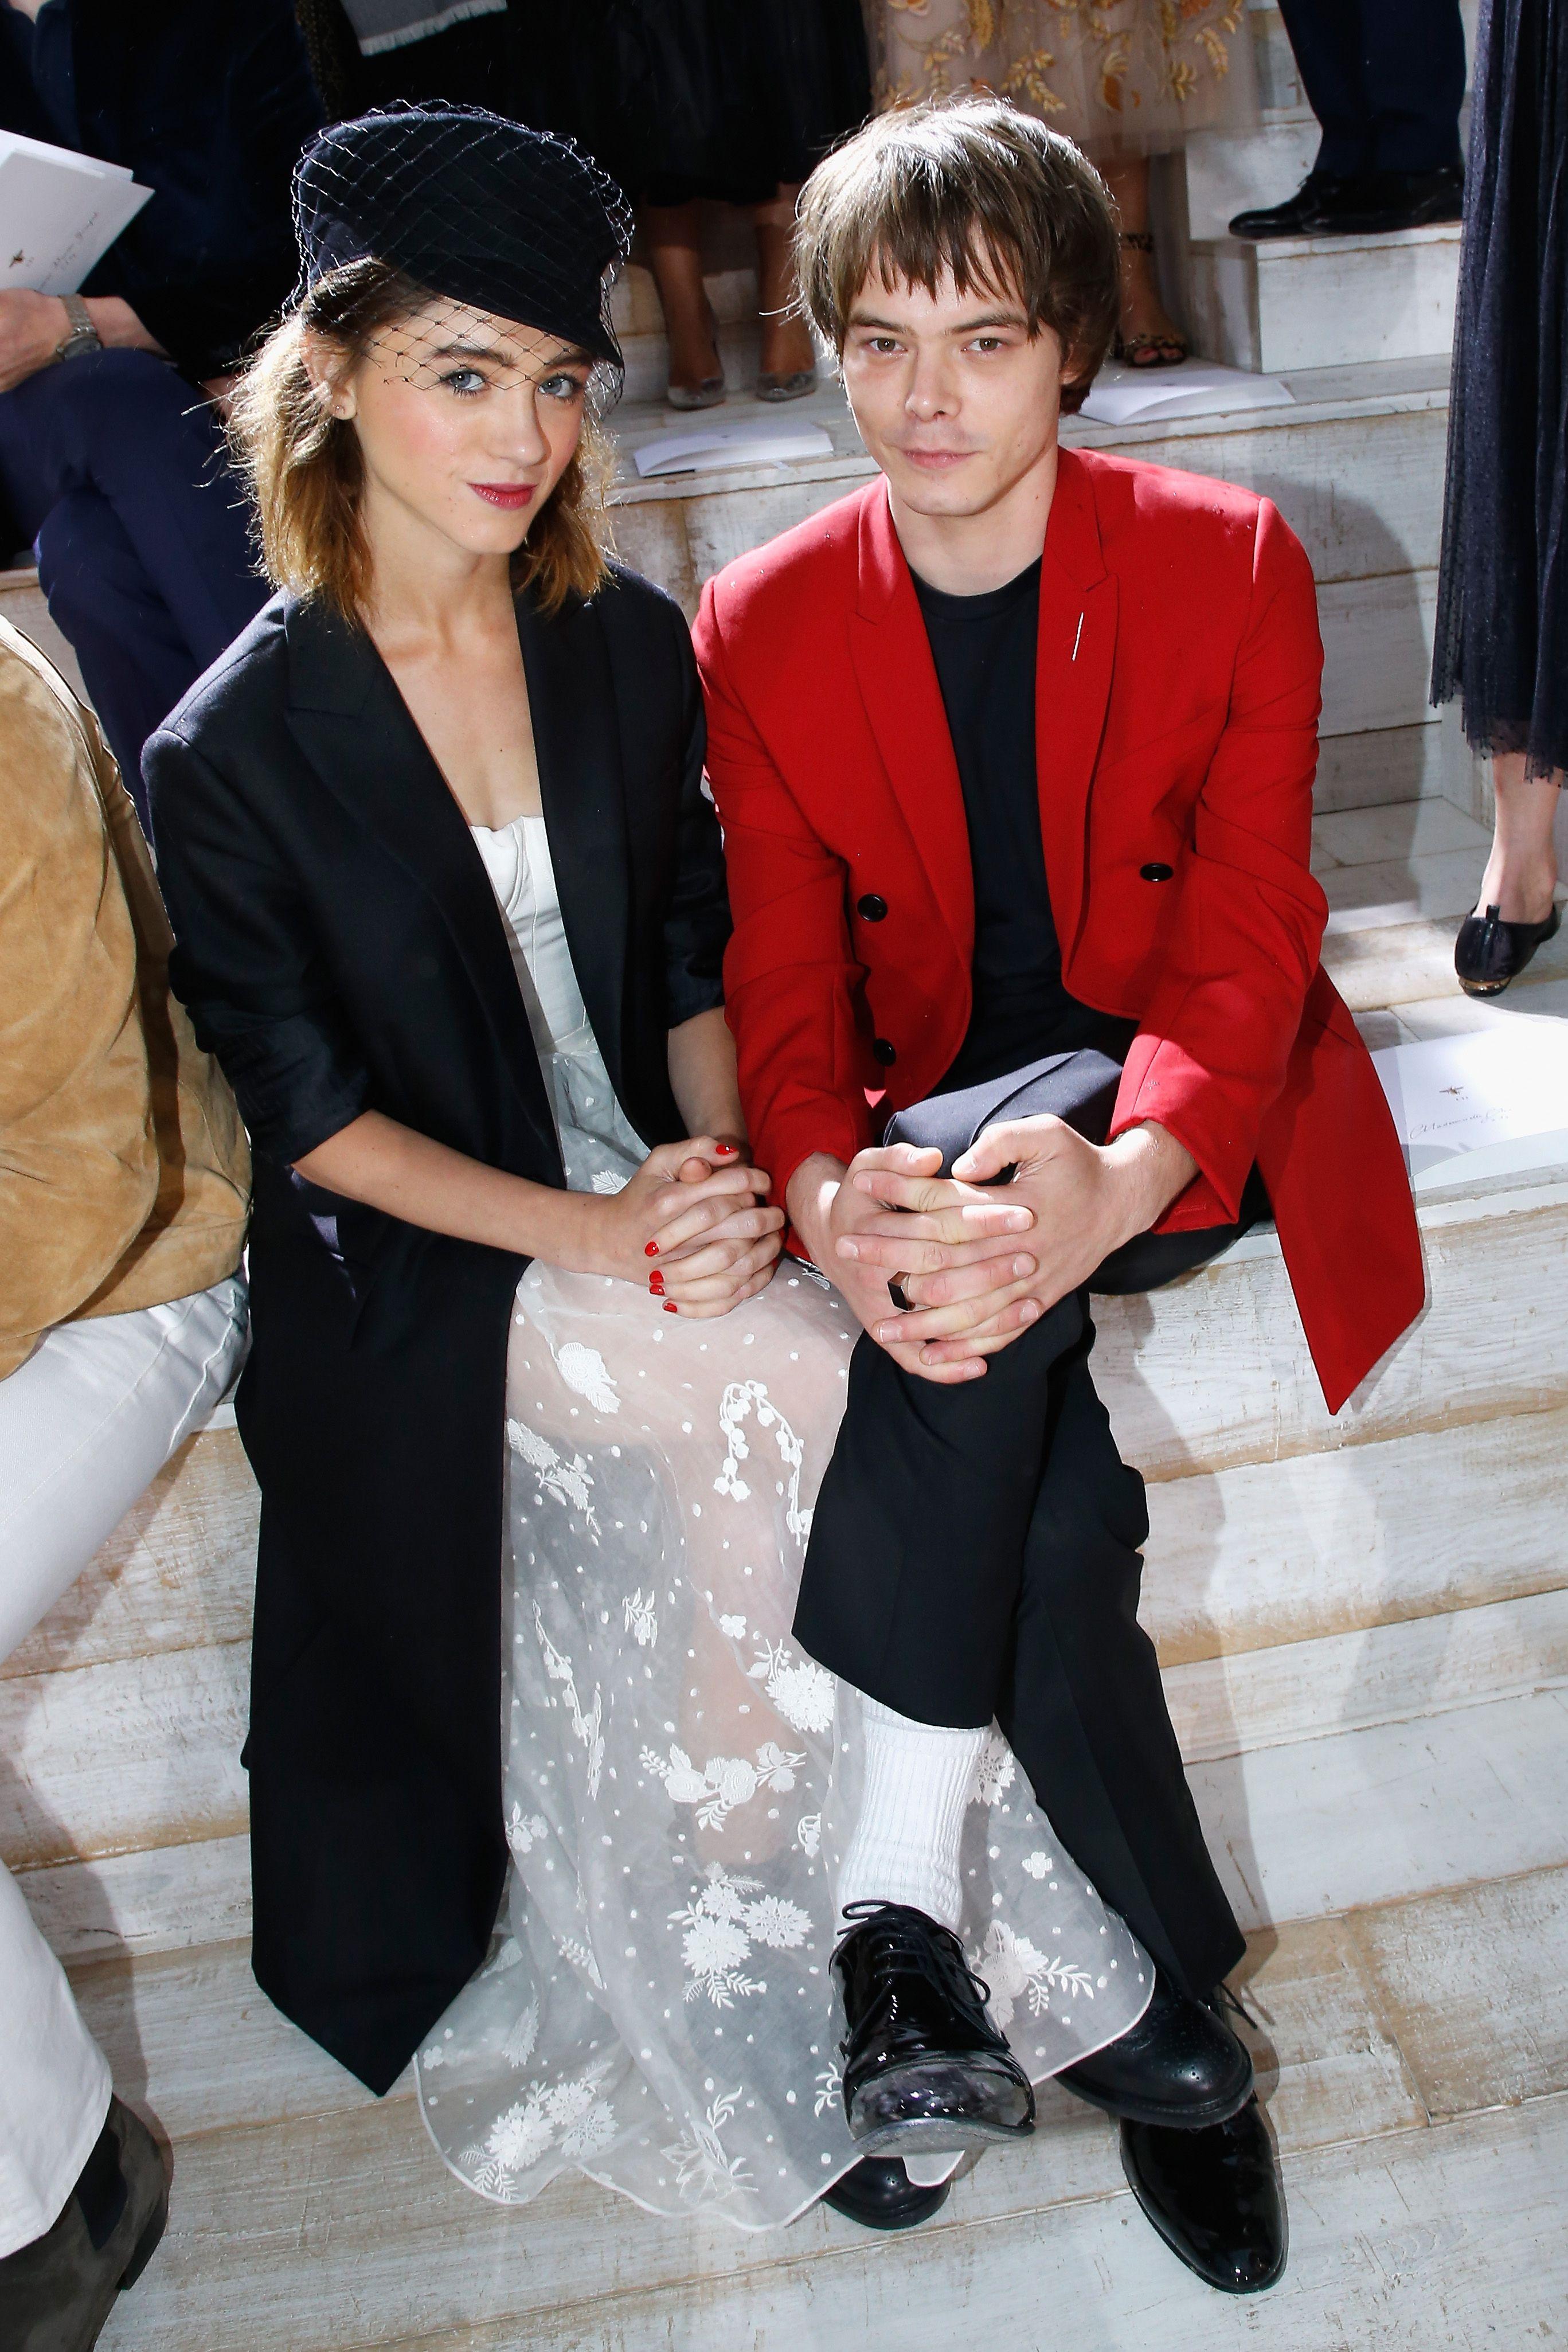 Natalia Dyer on Making 'Stranger Things' With Her Boyfriend